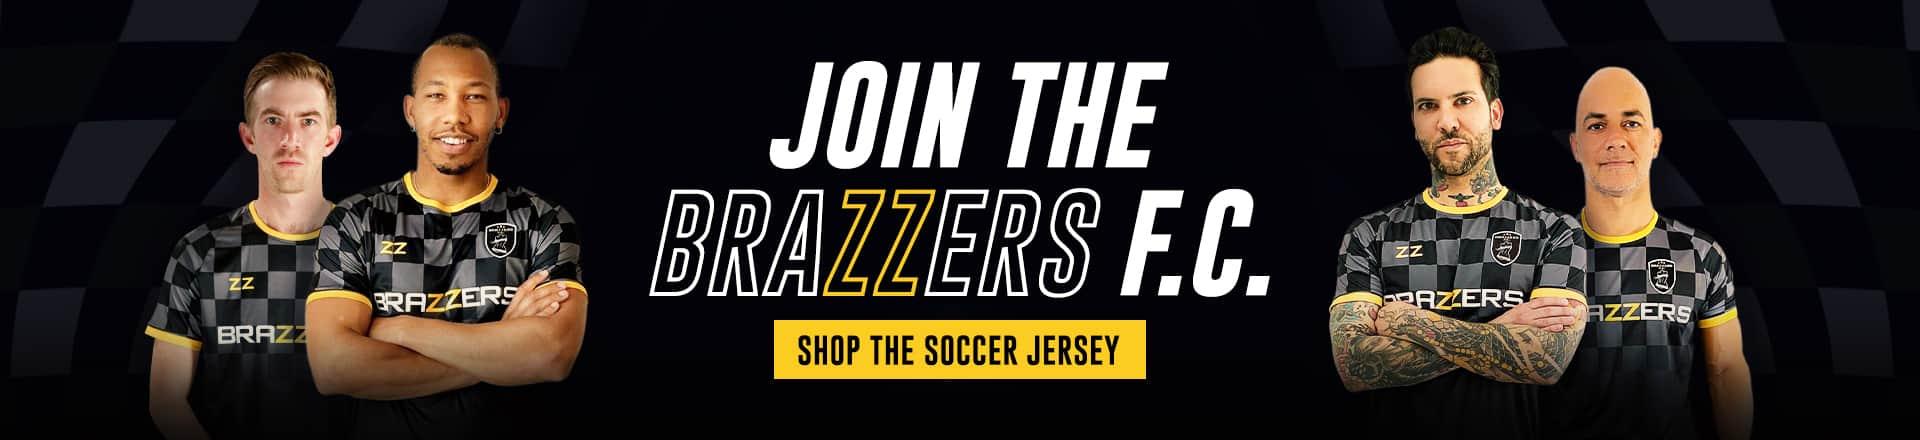 ZZS-Soccer-Jersey-promo_storebanner_pc_1920x440